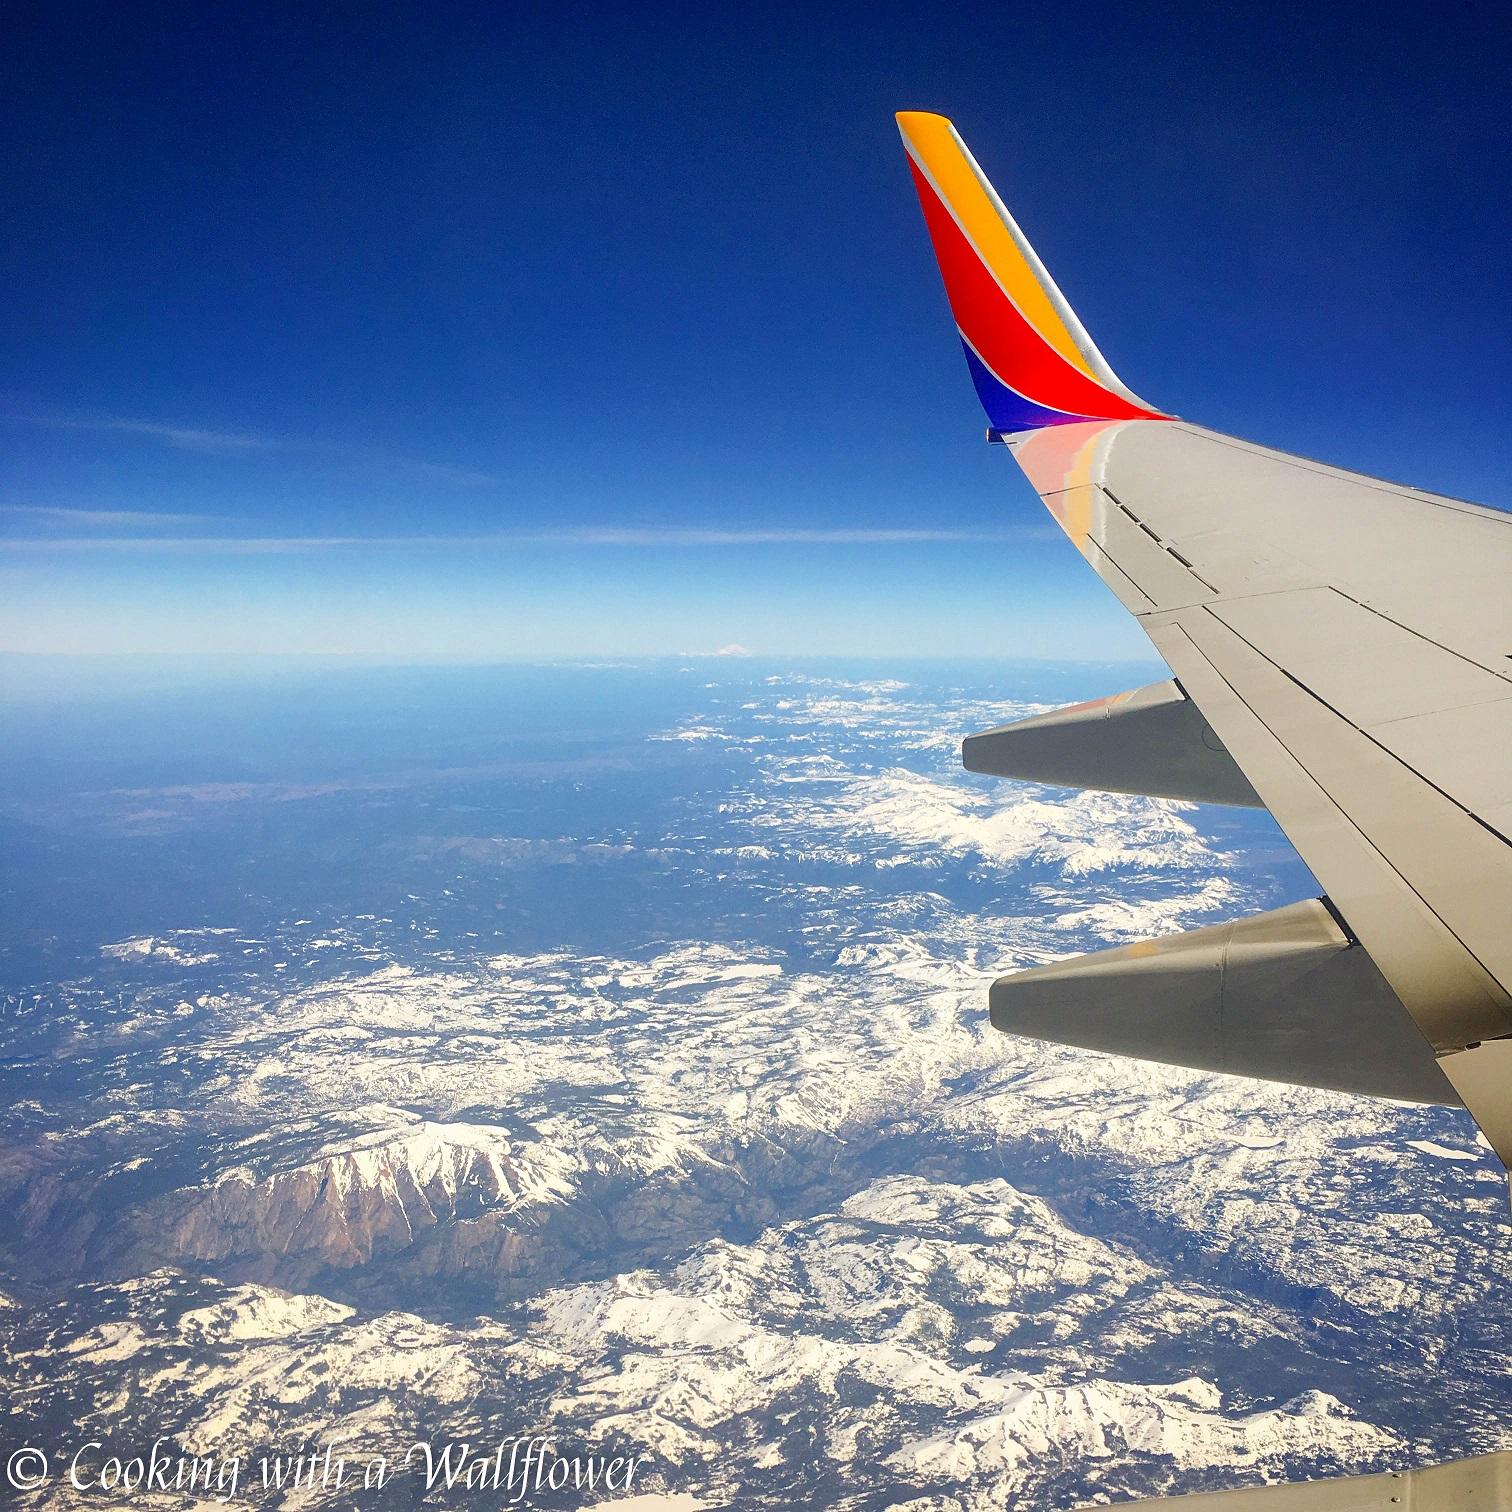 Destination: Discovering Colorado – Day 1